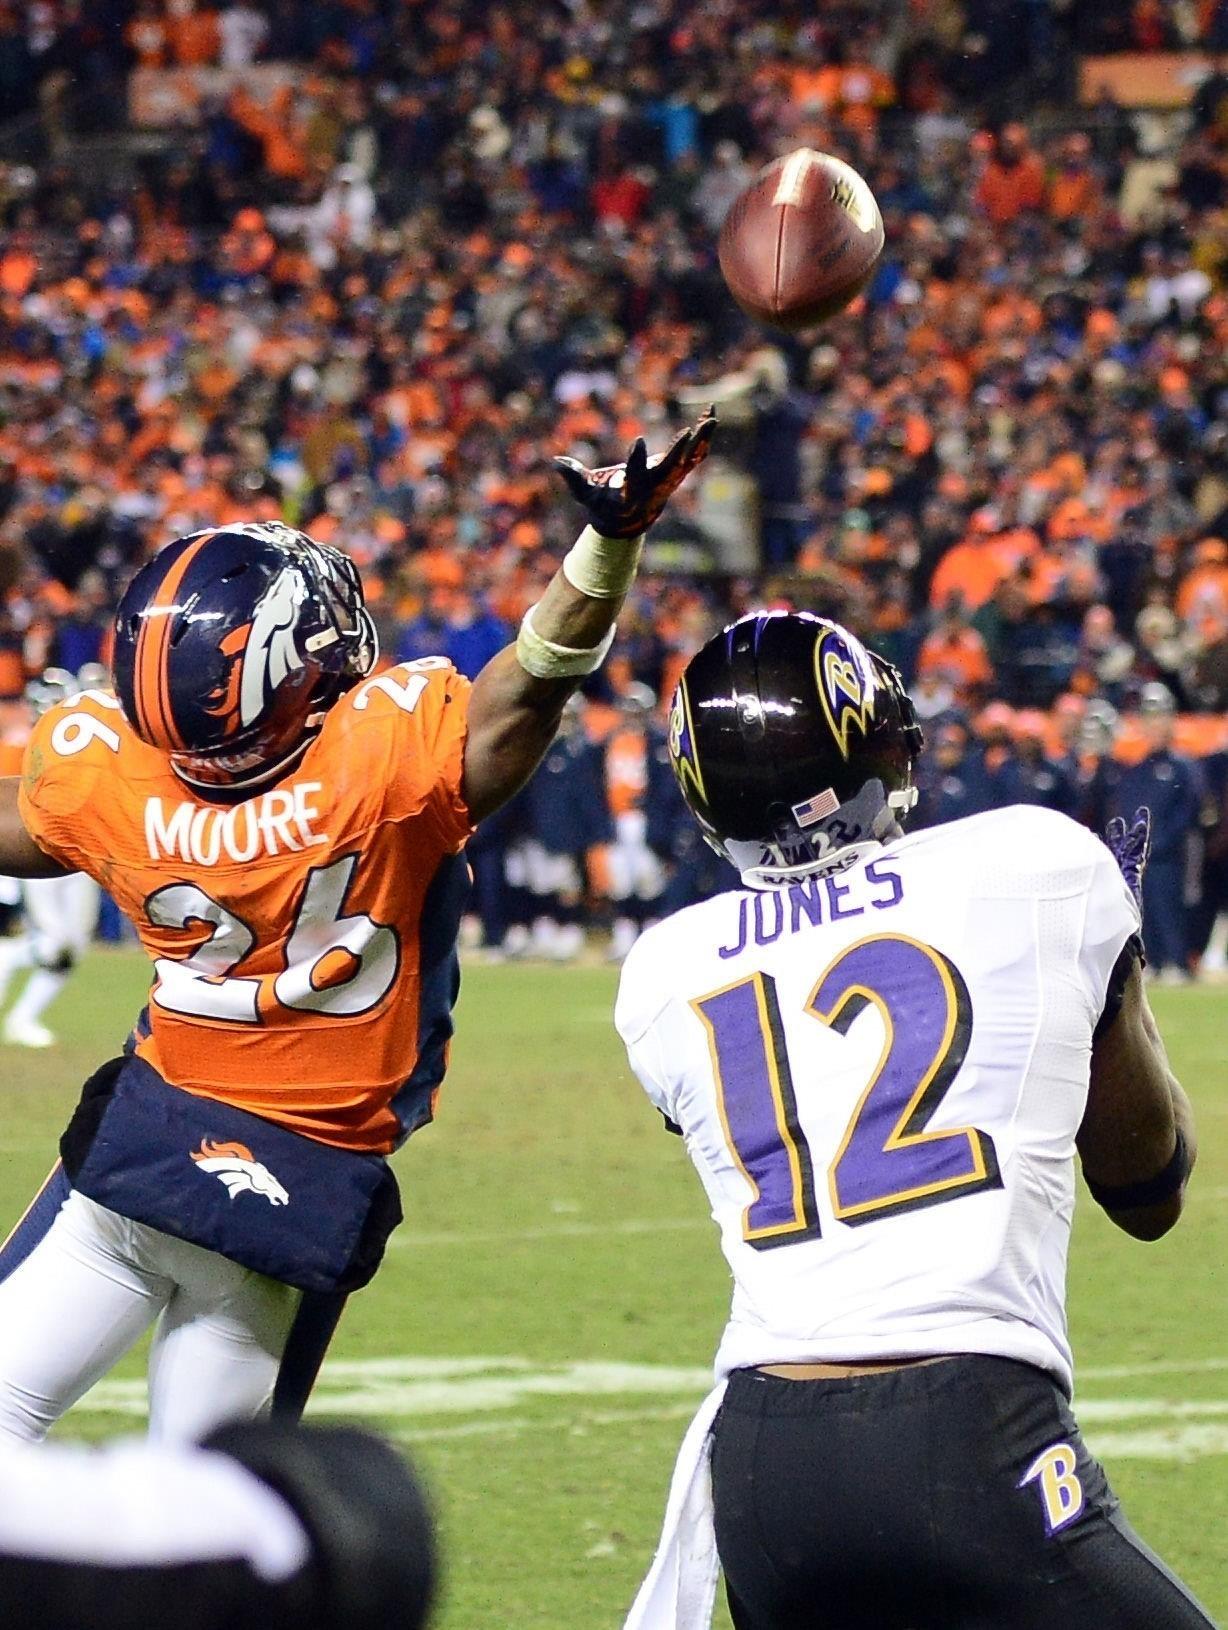 Denver still dwelling on Jacoby Jones' heroic TD - Baltimore Sun